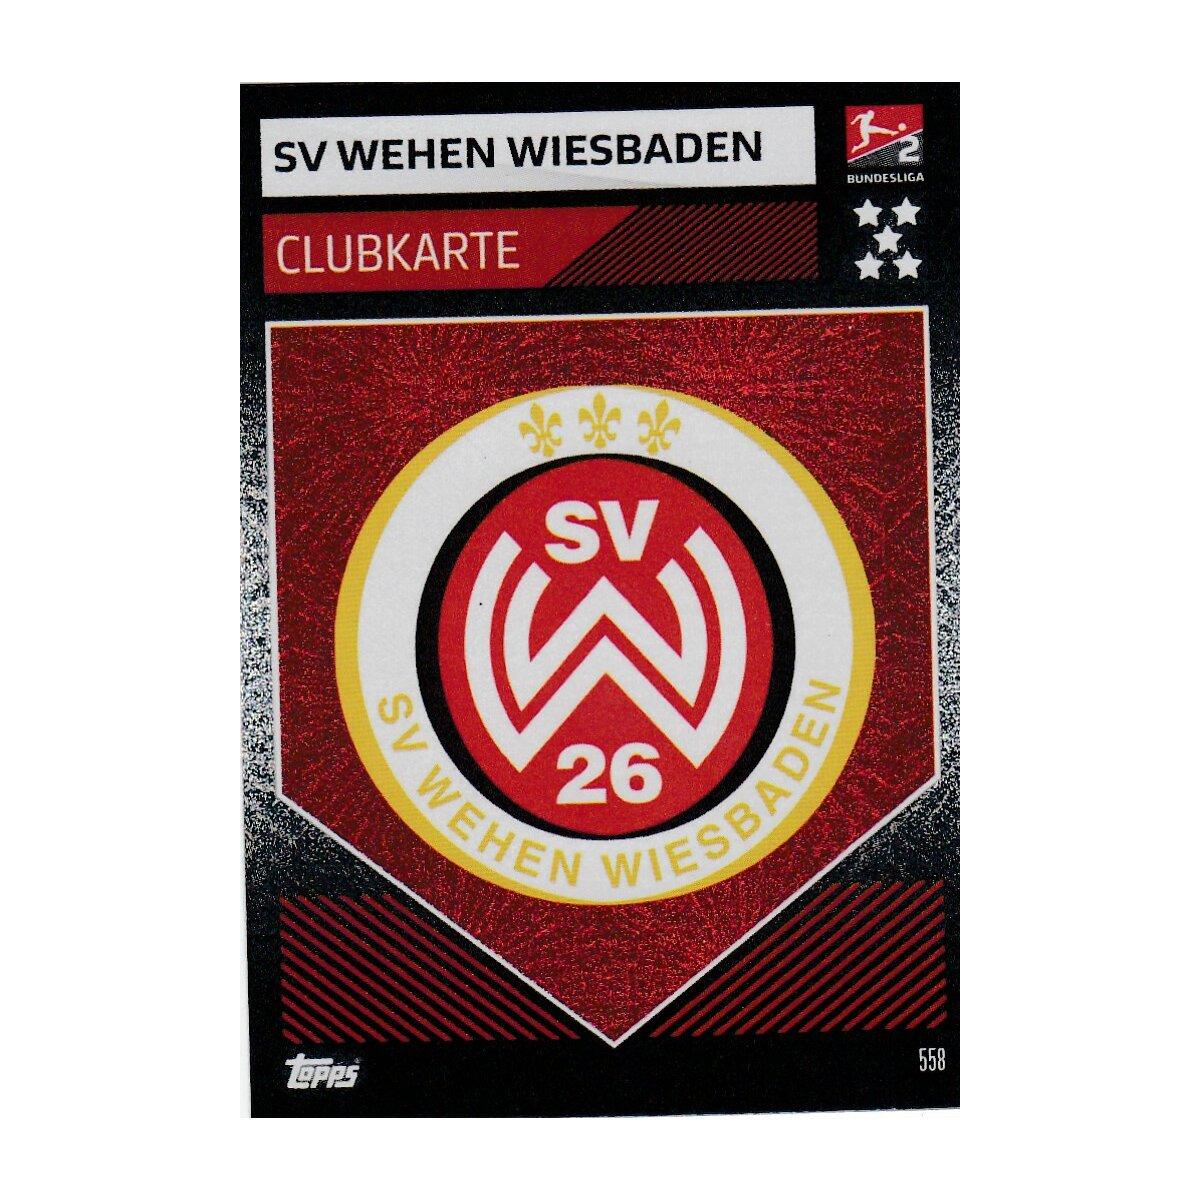 Match Attax Action 19//20 2019 20202-558 SV contractions Wiesbaden Carte